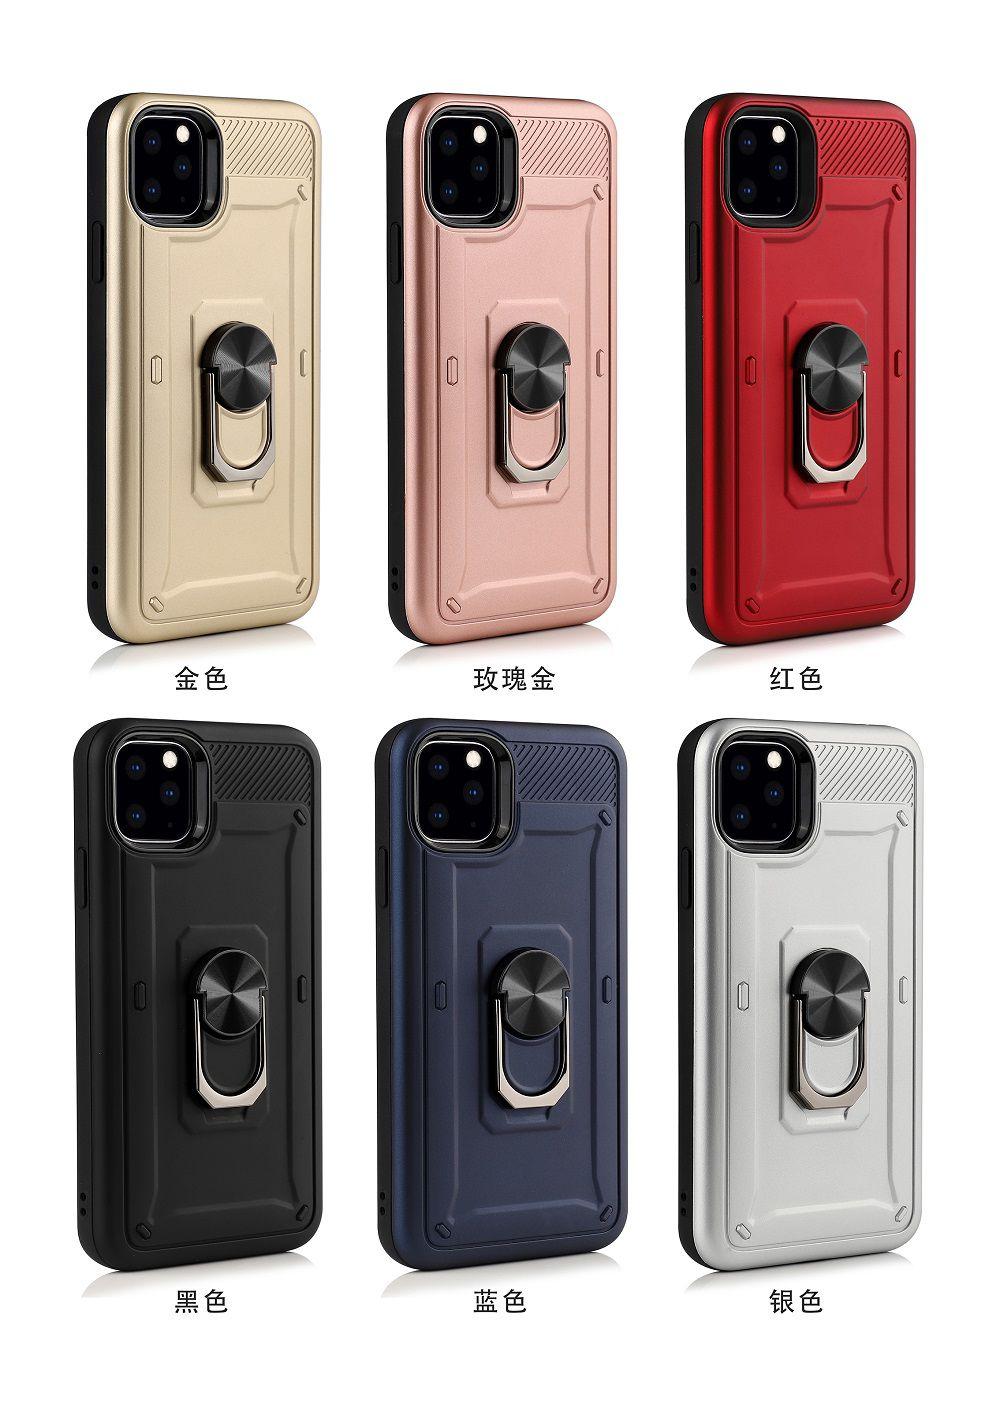 Capinha Shield c/ Anel Iphone 11, 11 Pro, 11 Pro Max